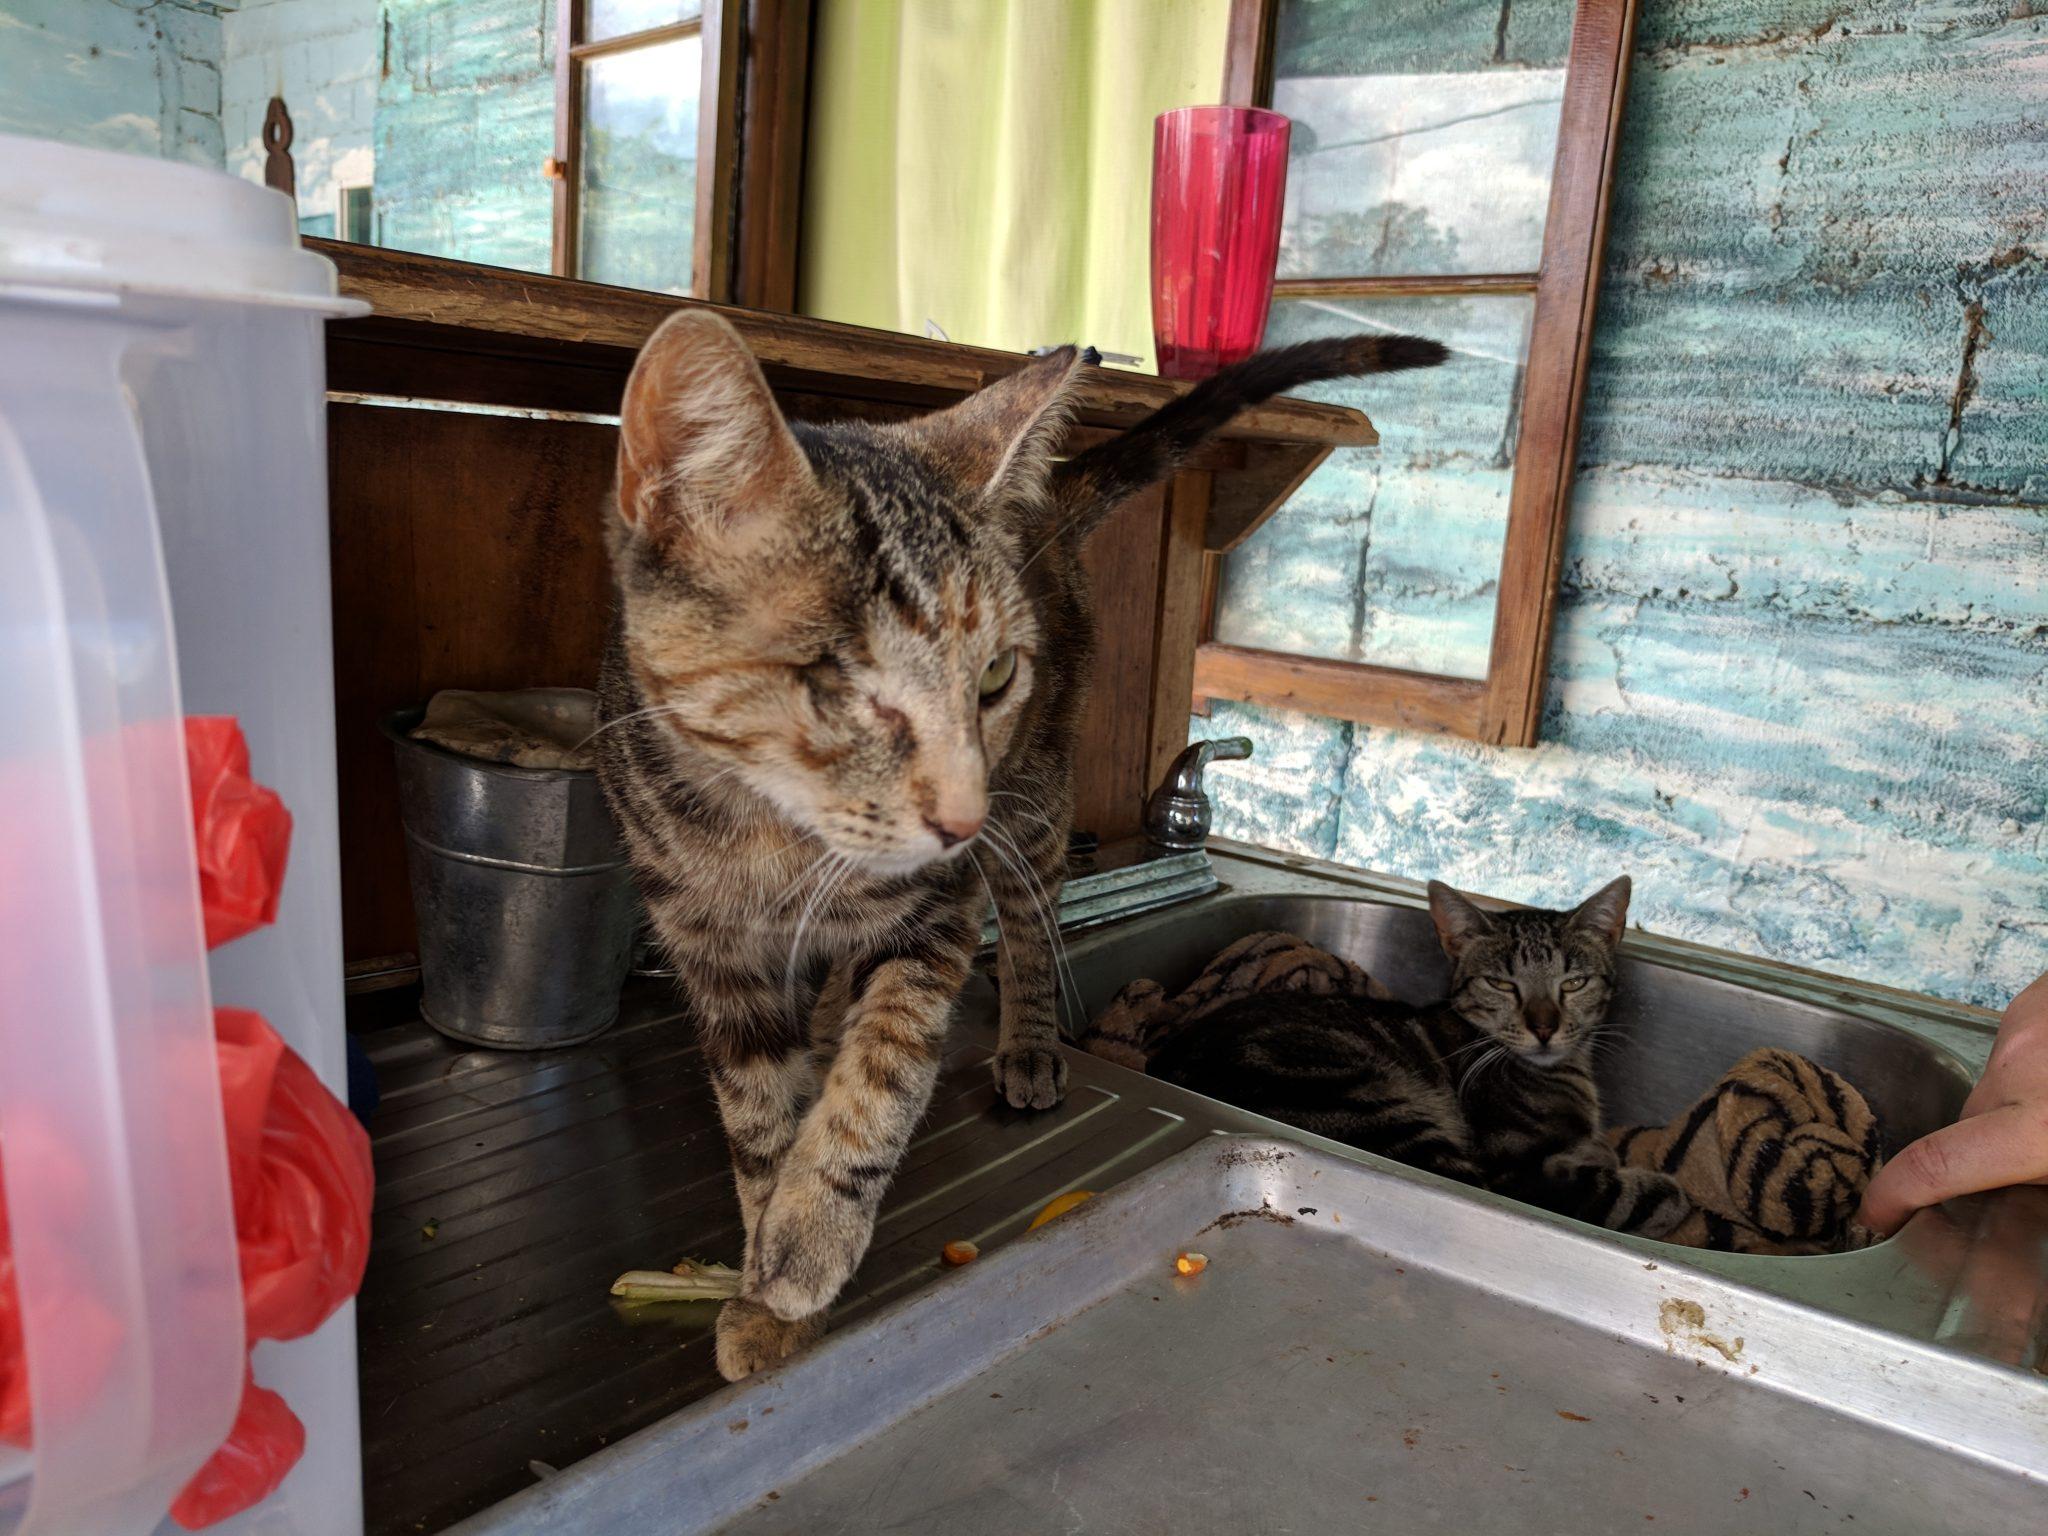 Jungla de Panama cat